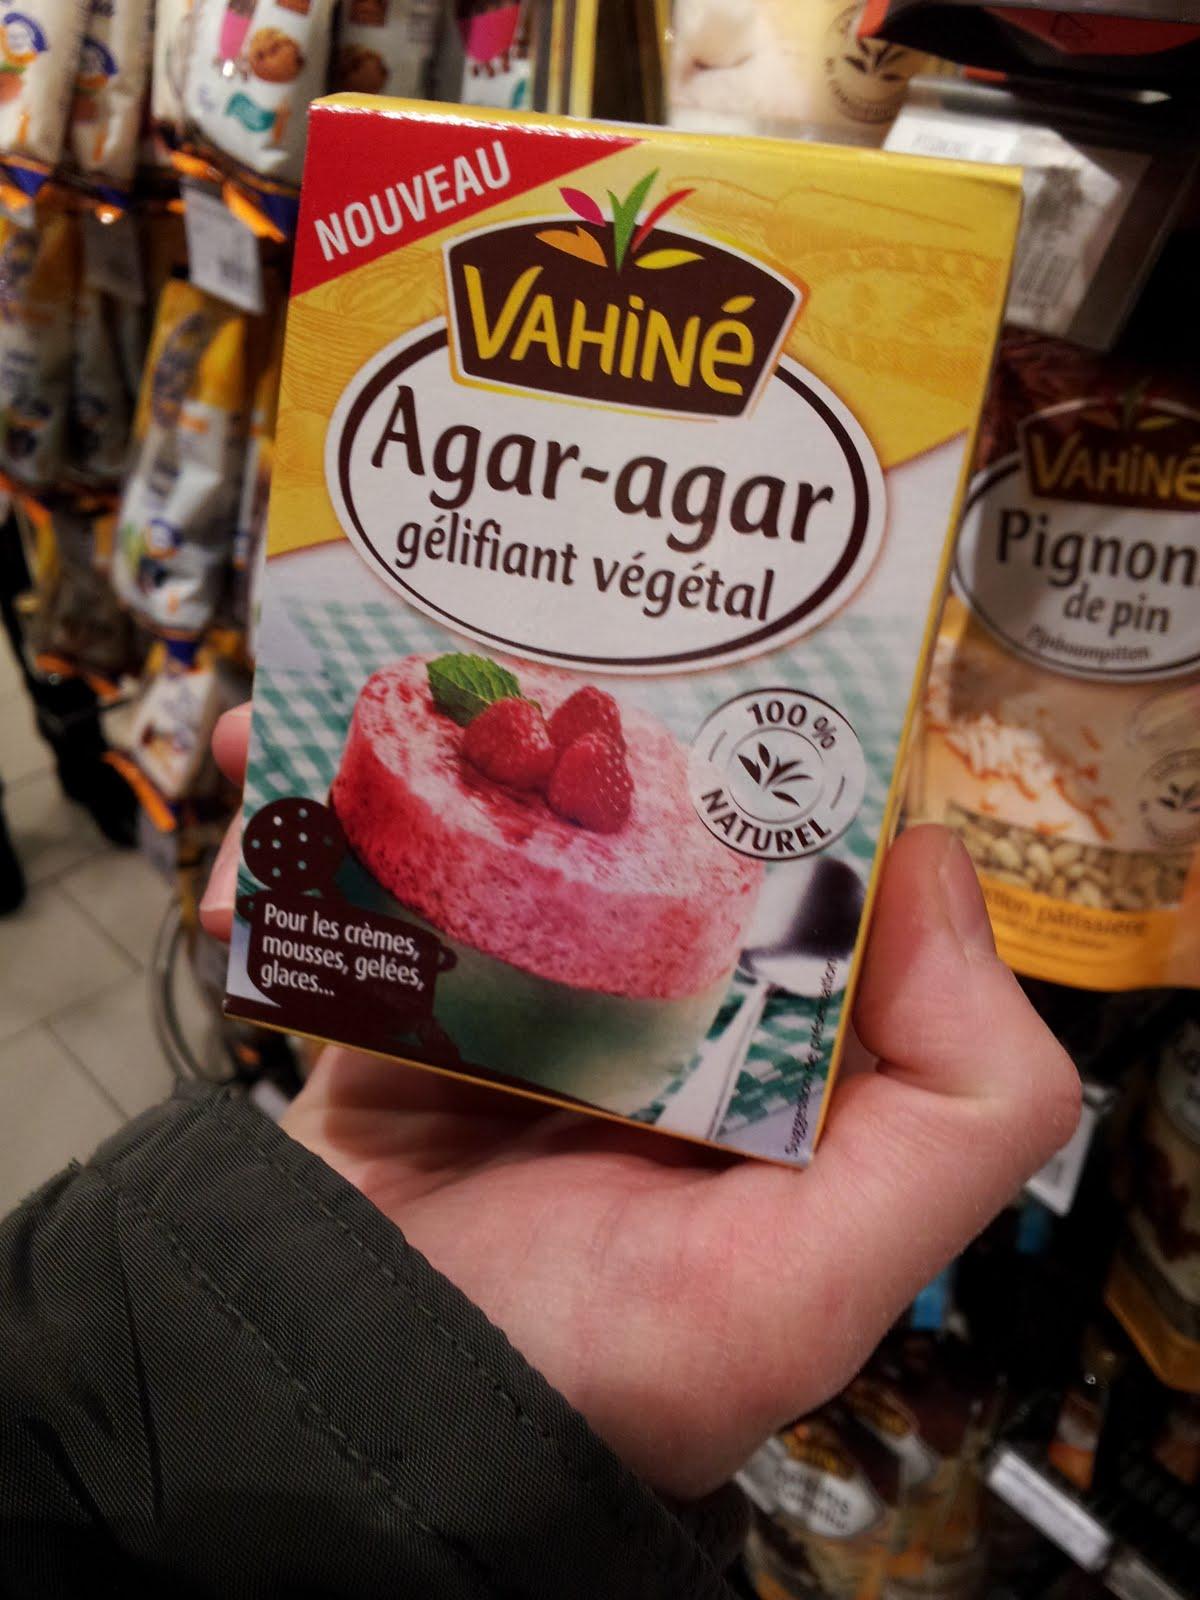 De l'agar-agar en supermarché, herboristerie, pharmacie